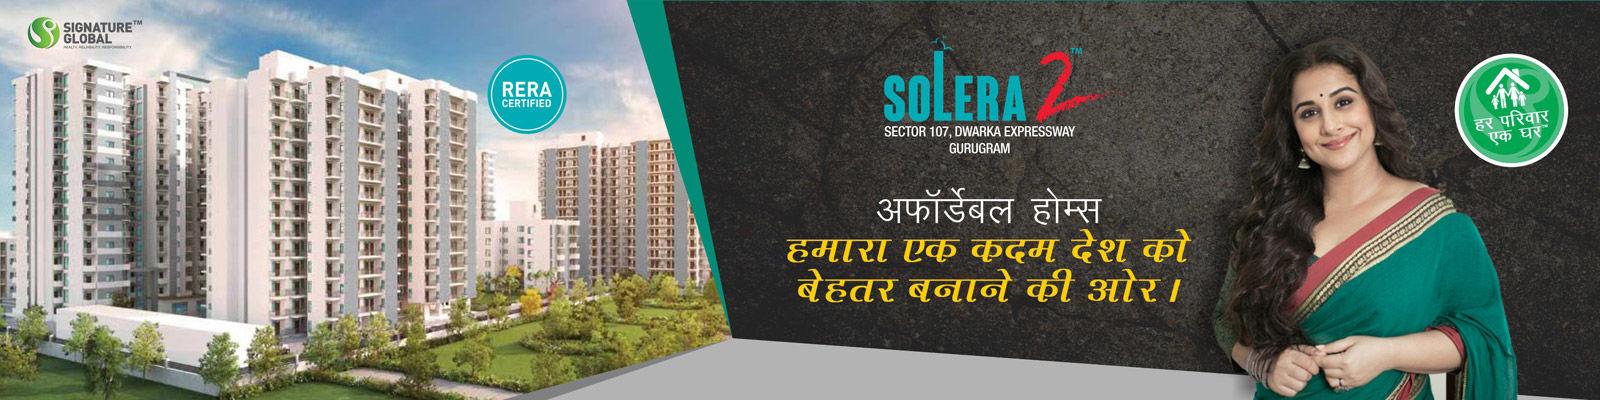 Signature Global Solera 2 Sector 107 Gurgaon - Affordable Housing Gurgaon